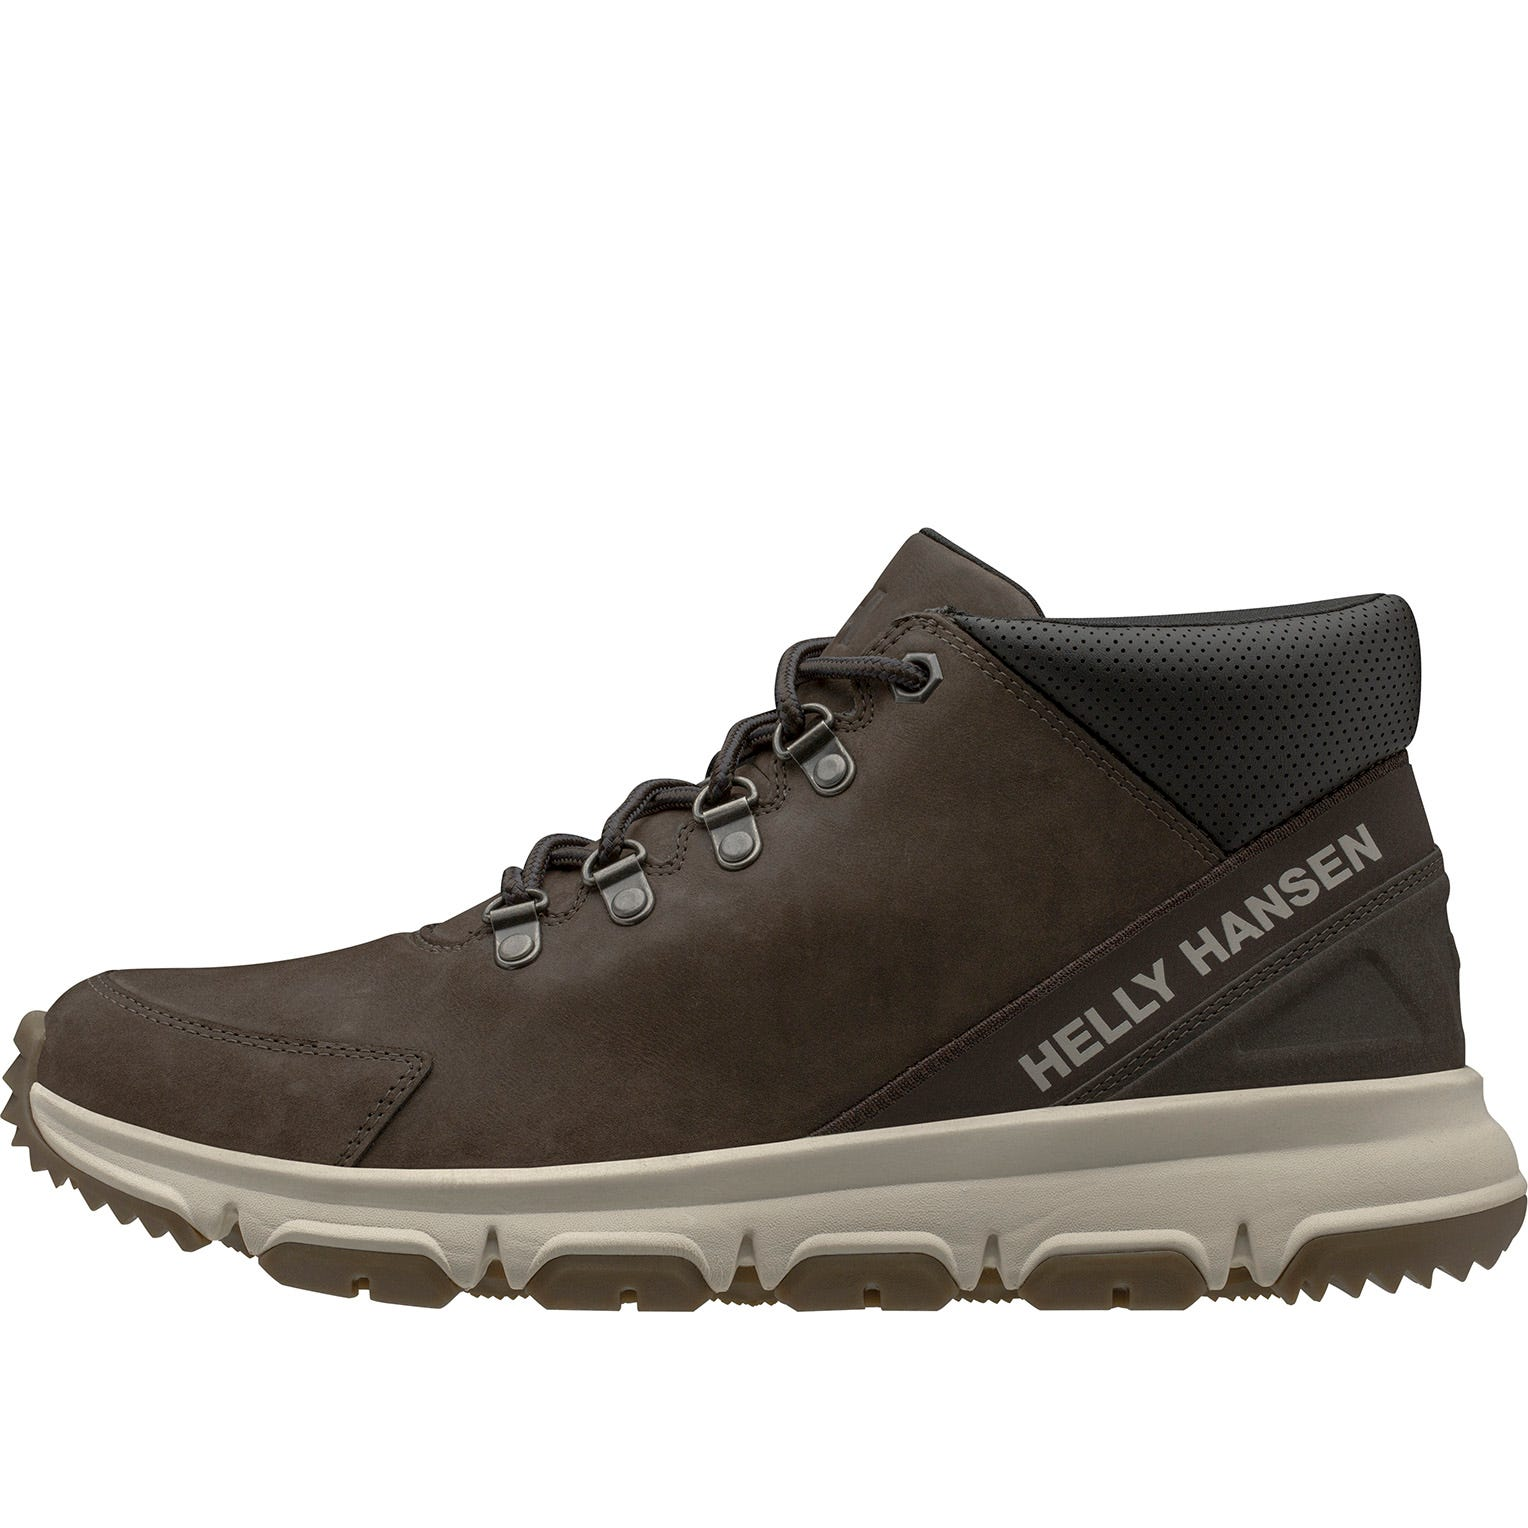 Helly Hansen Mens Fendvard Waterproof Leather Boots 8